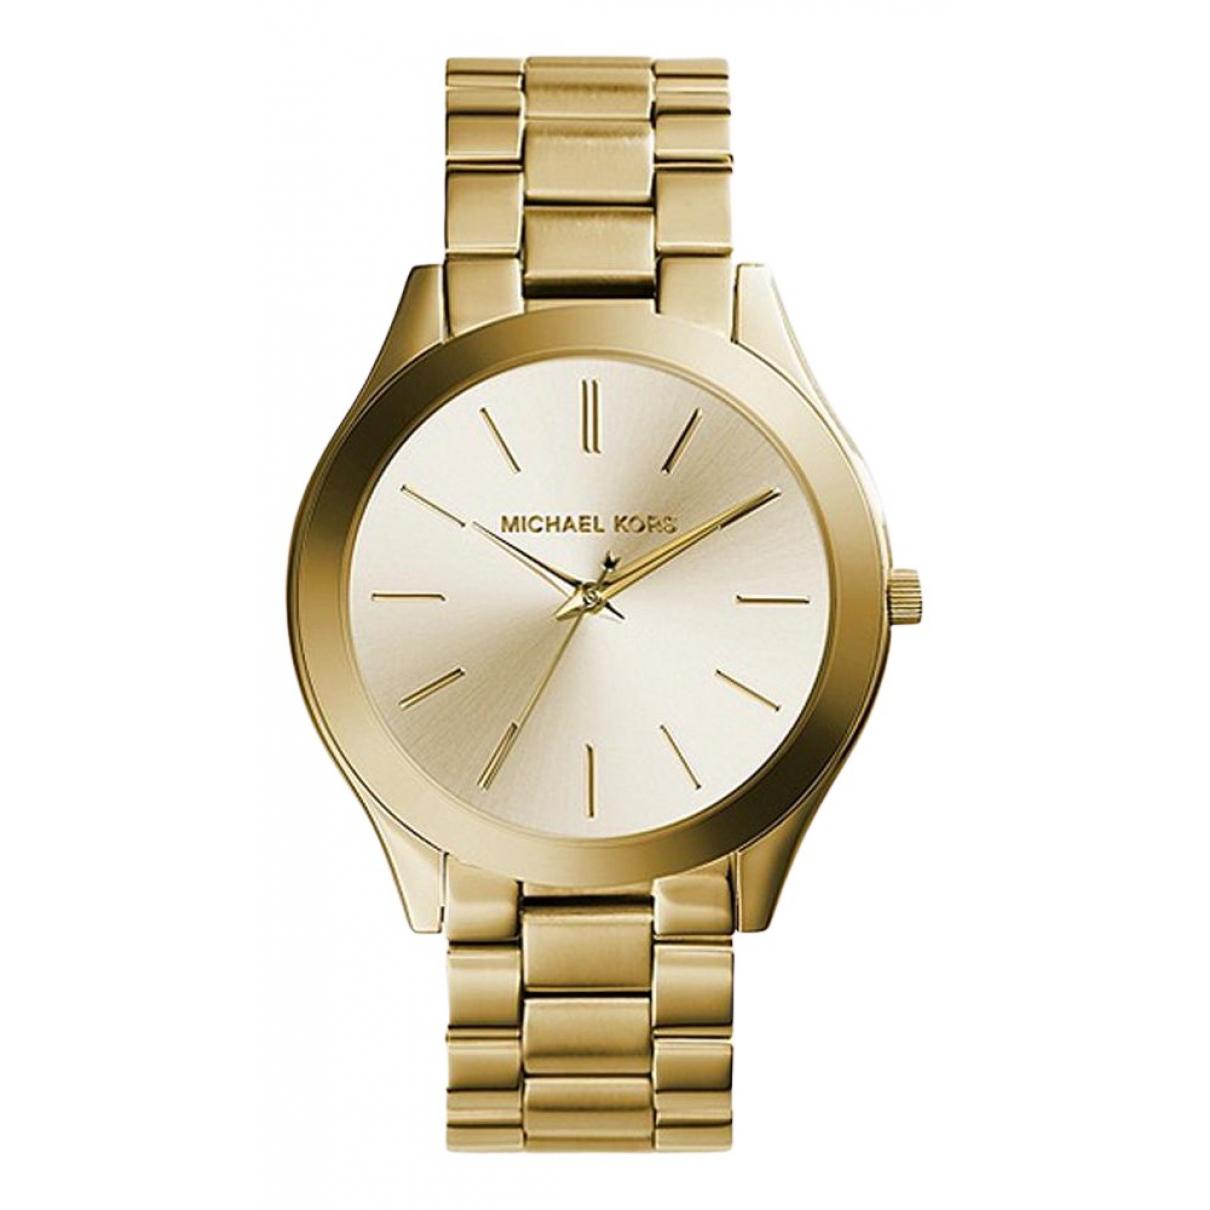 Michael Kors \N Uhr in  Gold Gelbgold